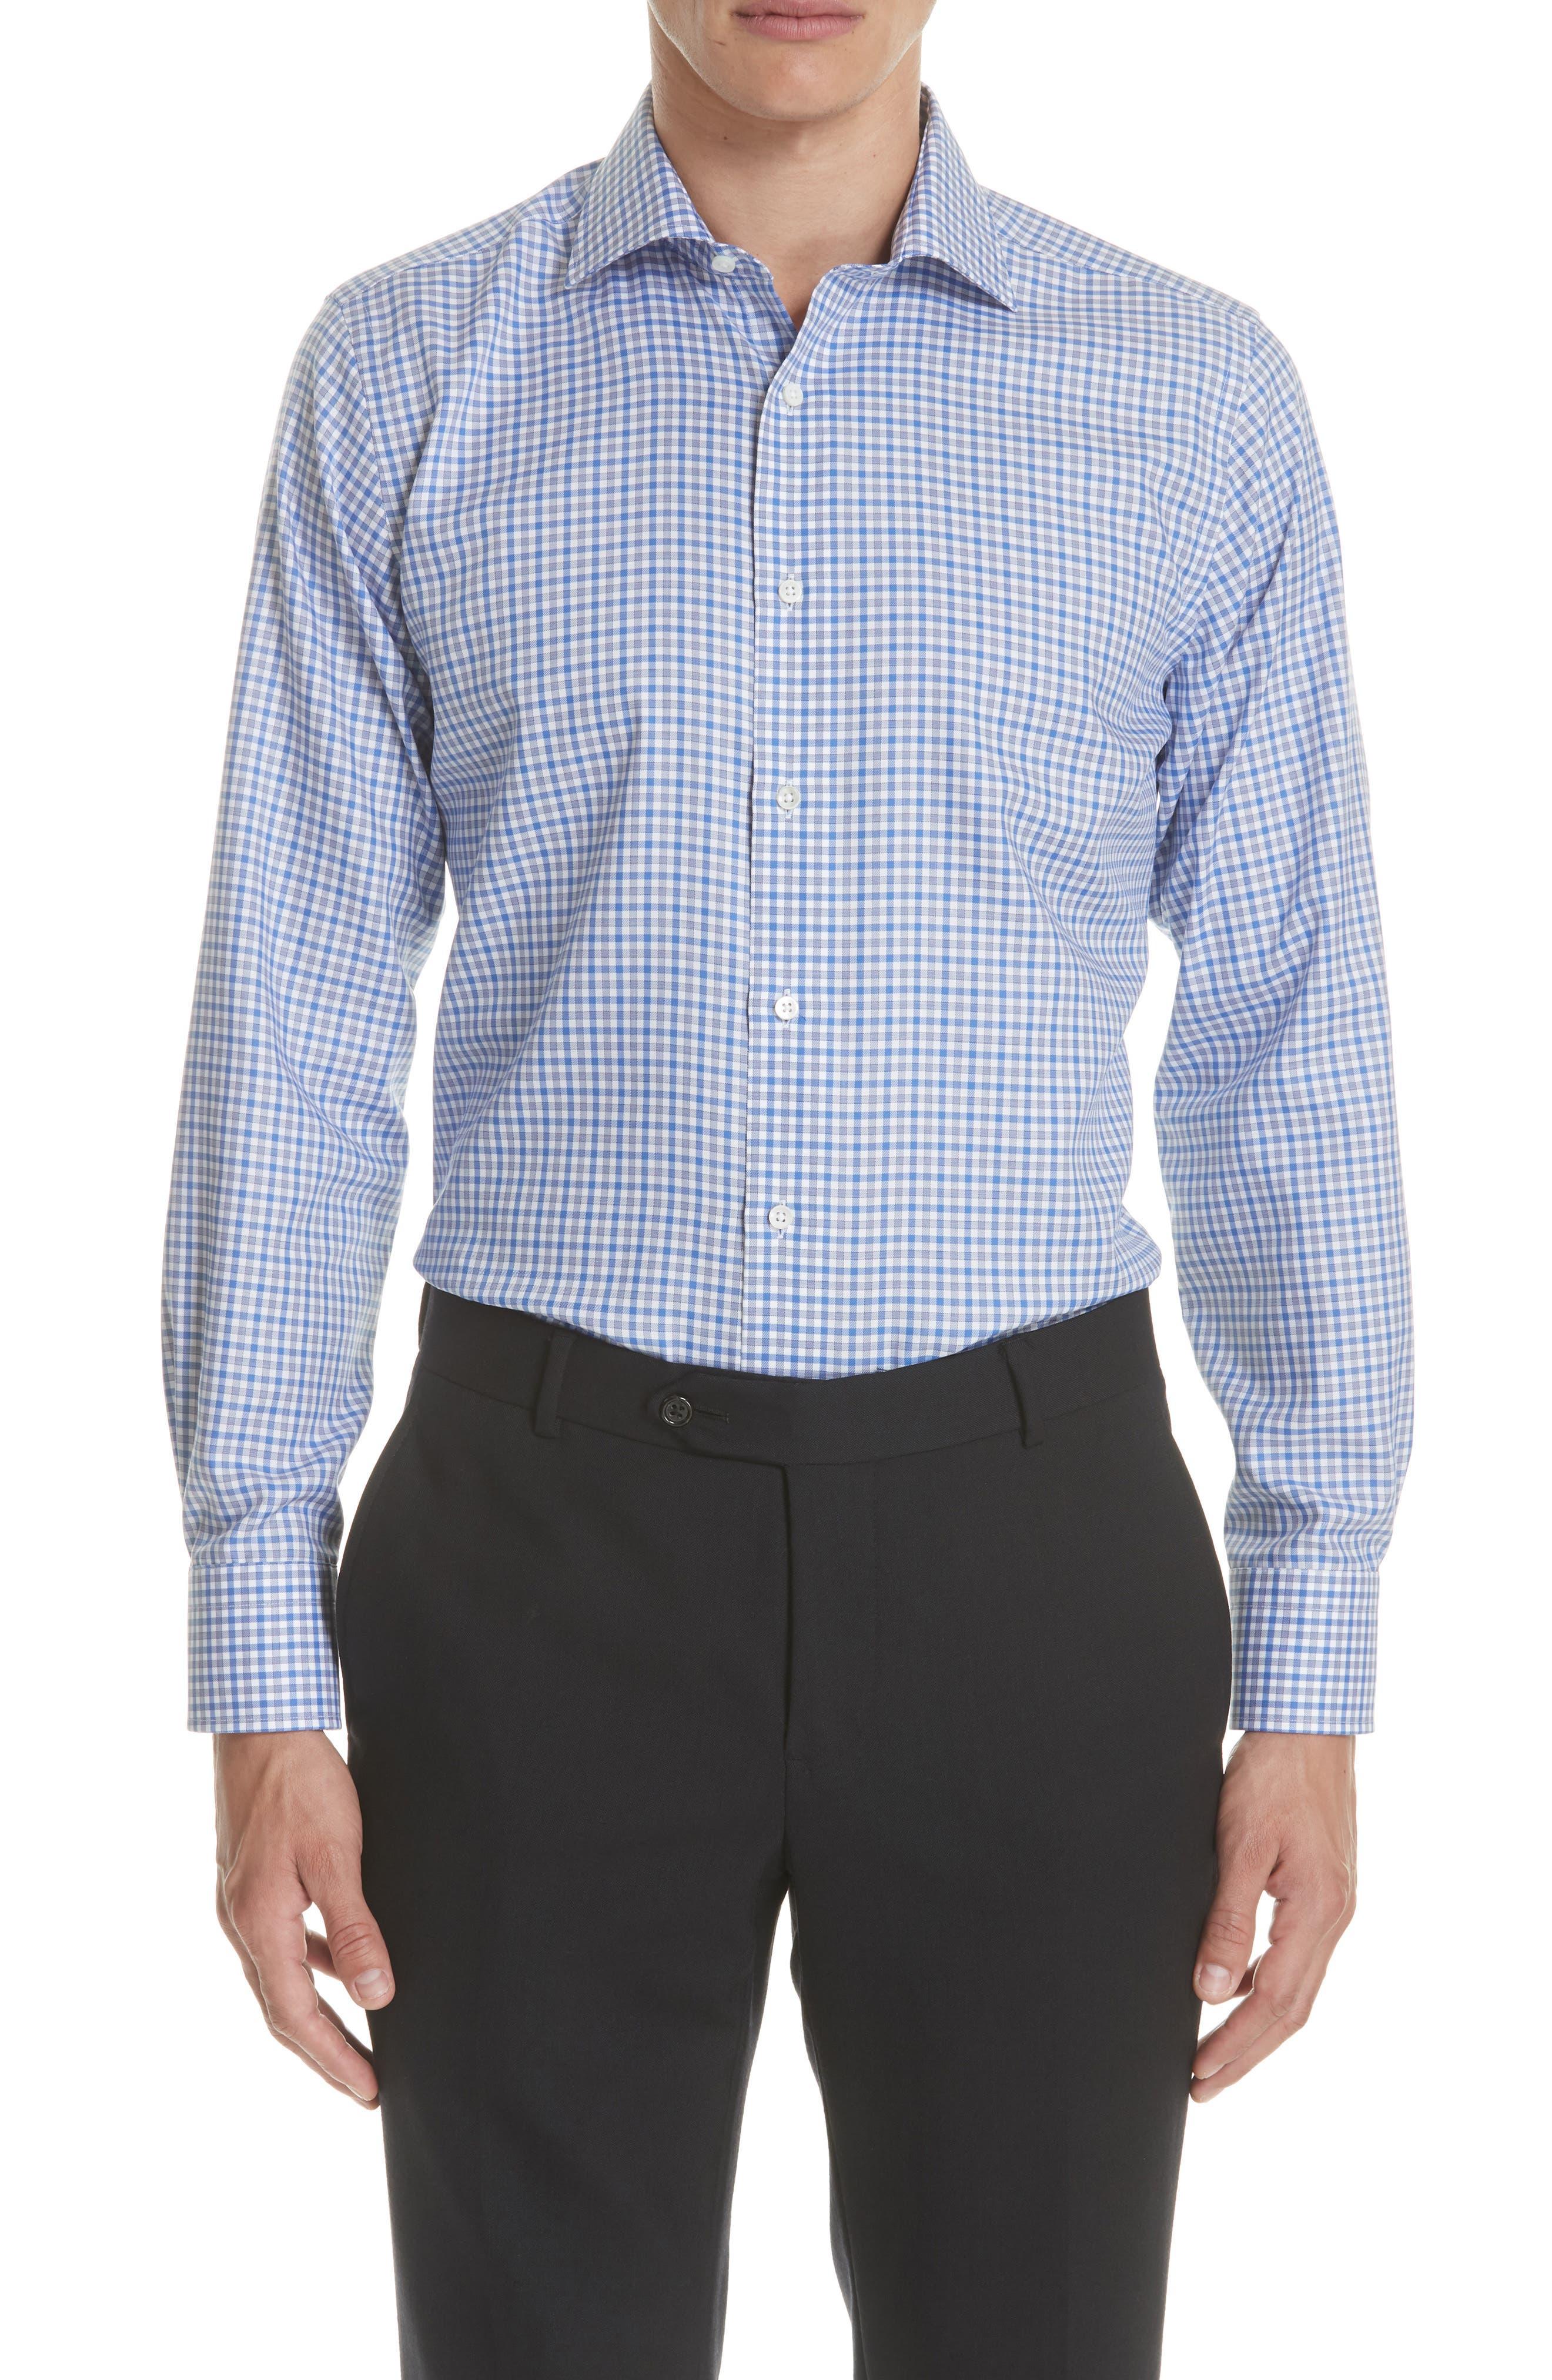 Regular Fit Non-Iron Check Dress Shirt,                             Main thumbnail 1, color,                             Med Blue